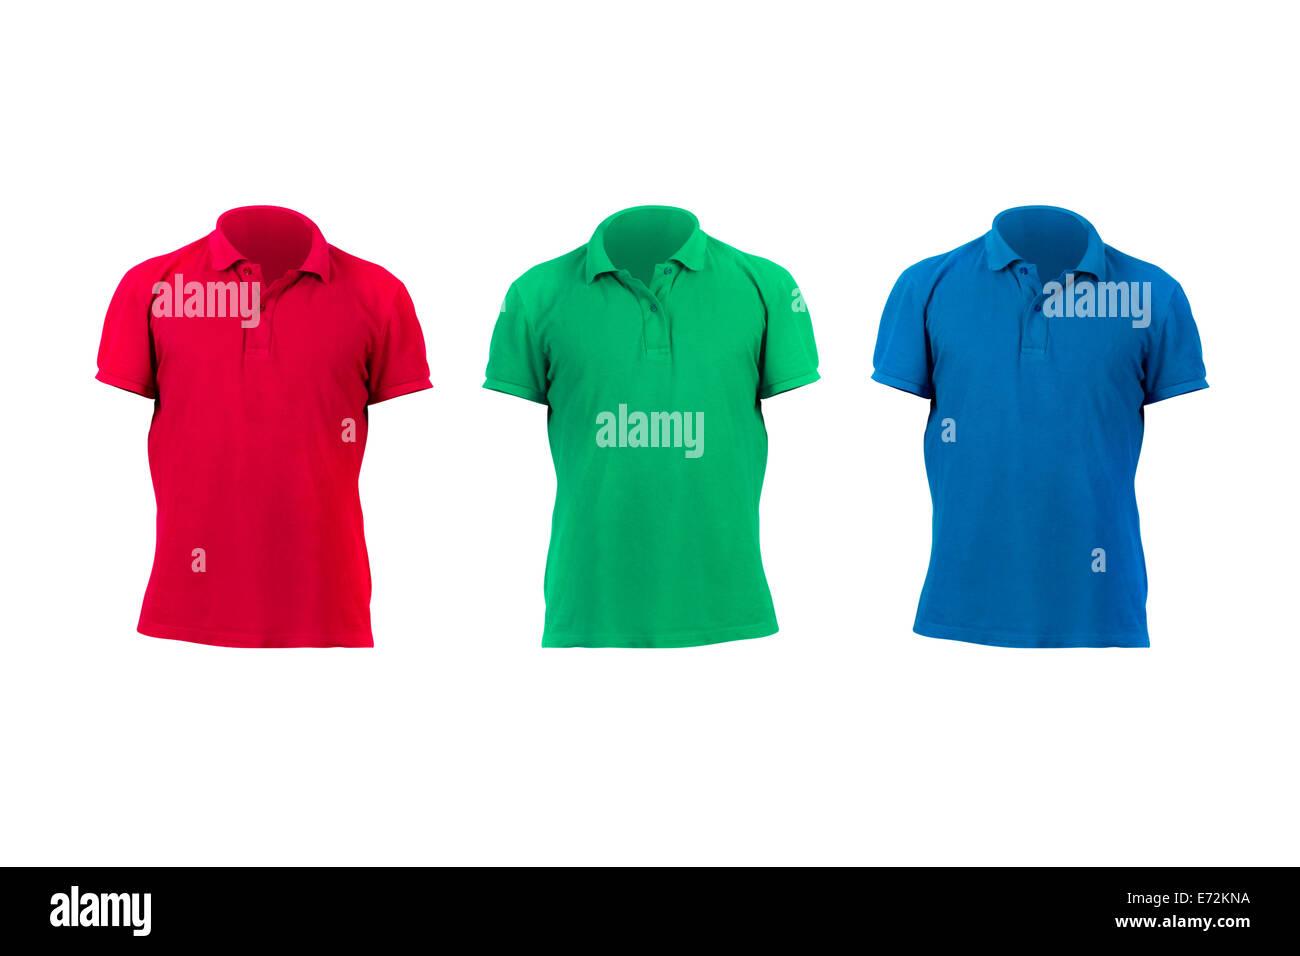 eec565269120f Alamy Satinhemd Alamy Stockfotosamp  Bilder Blaues Blaues Satinhemd Bilder  Stockfotosamp  oerxBWdC